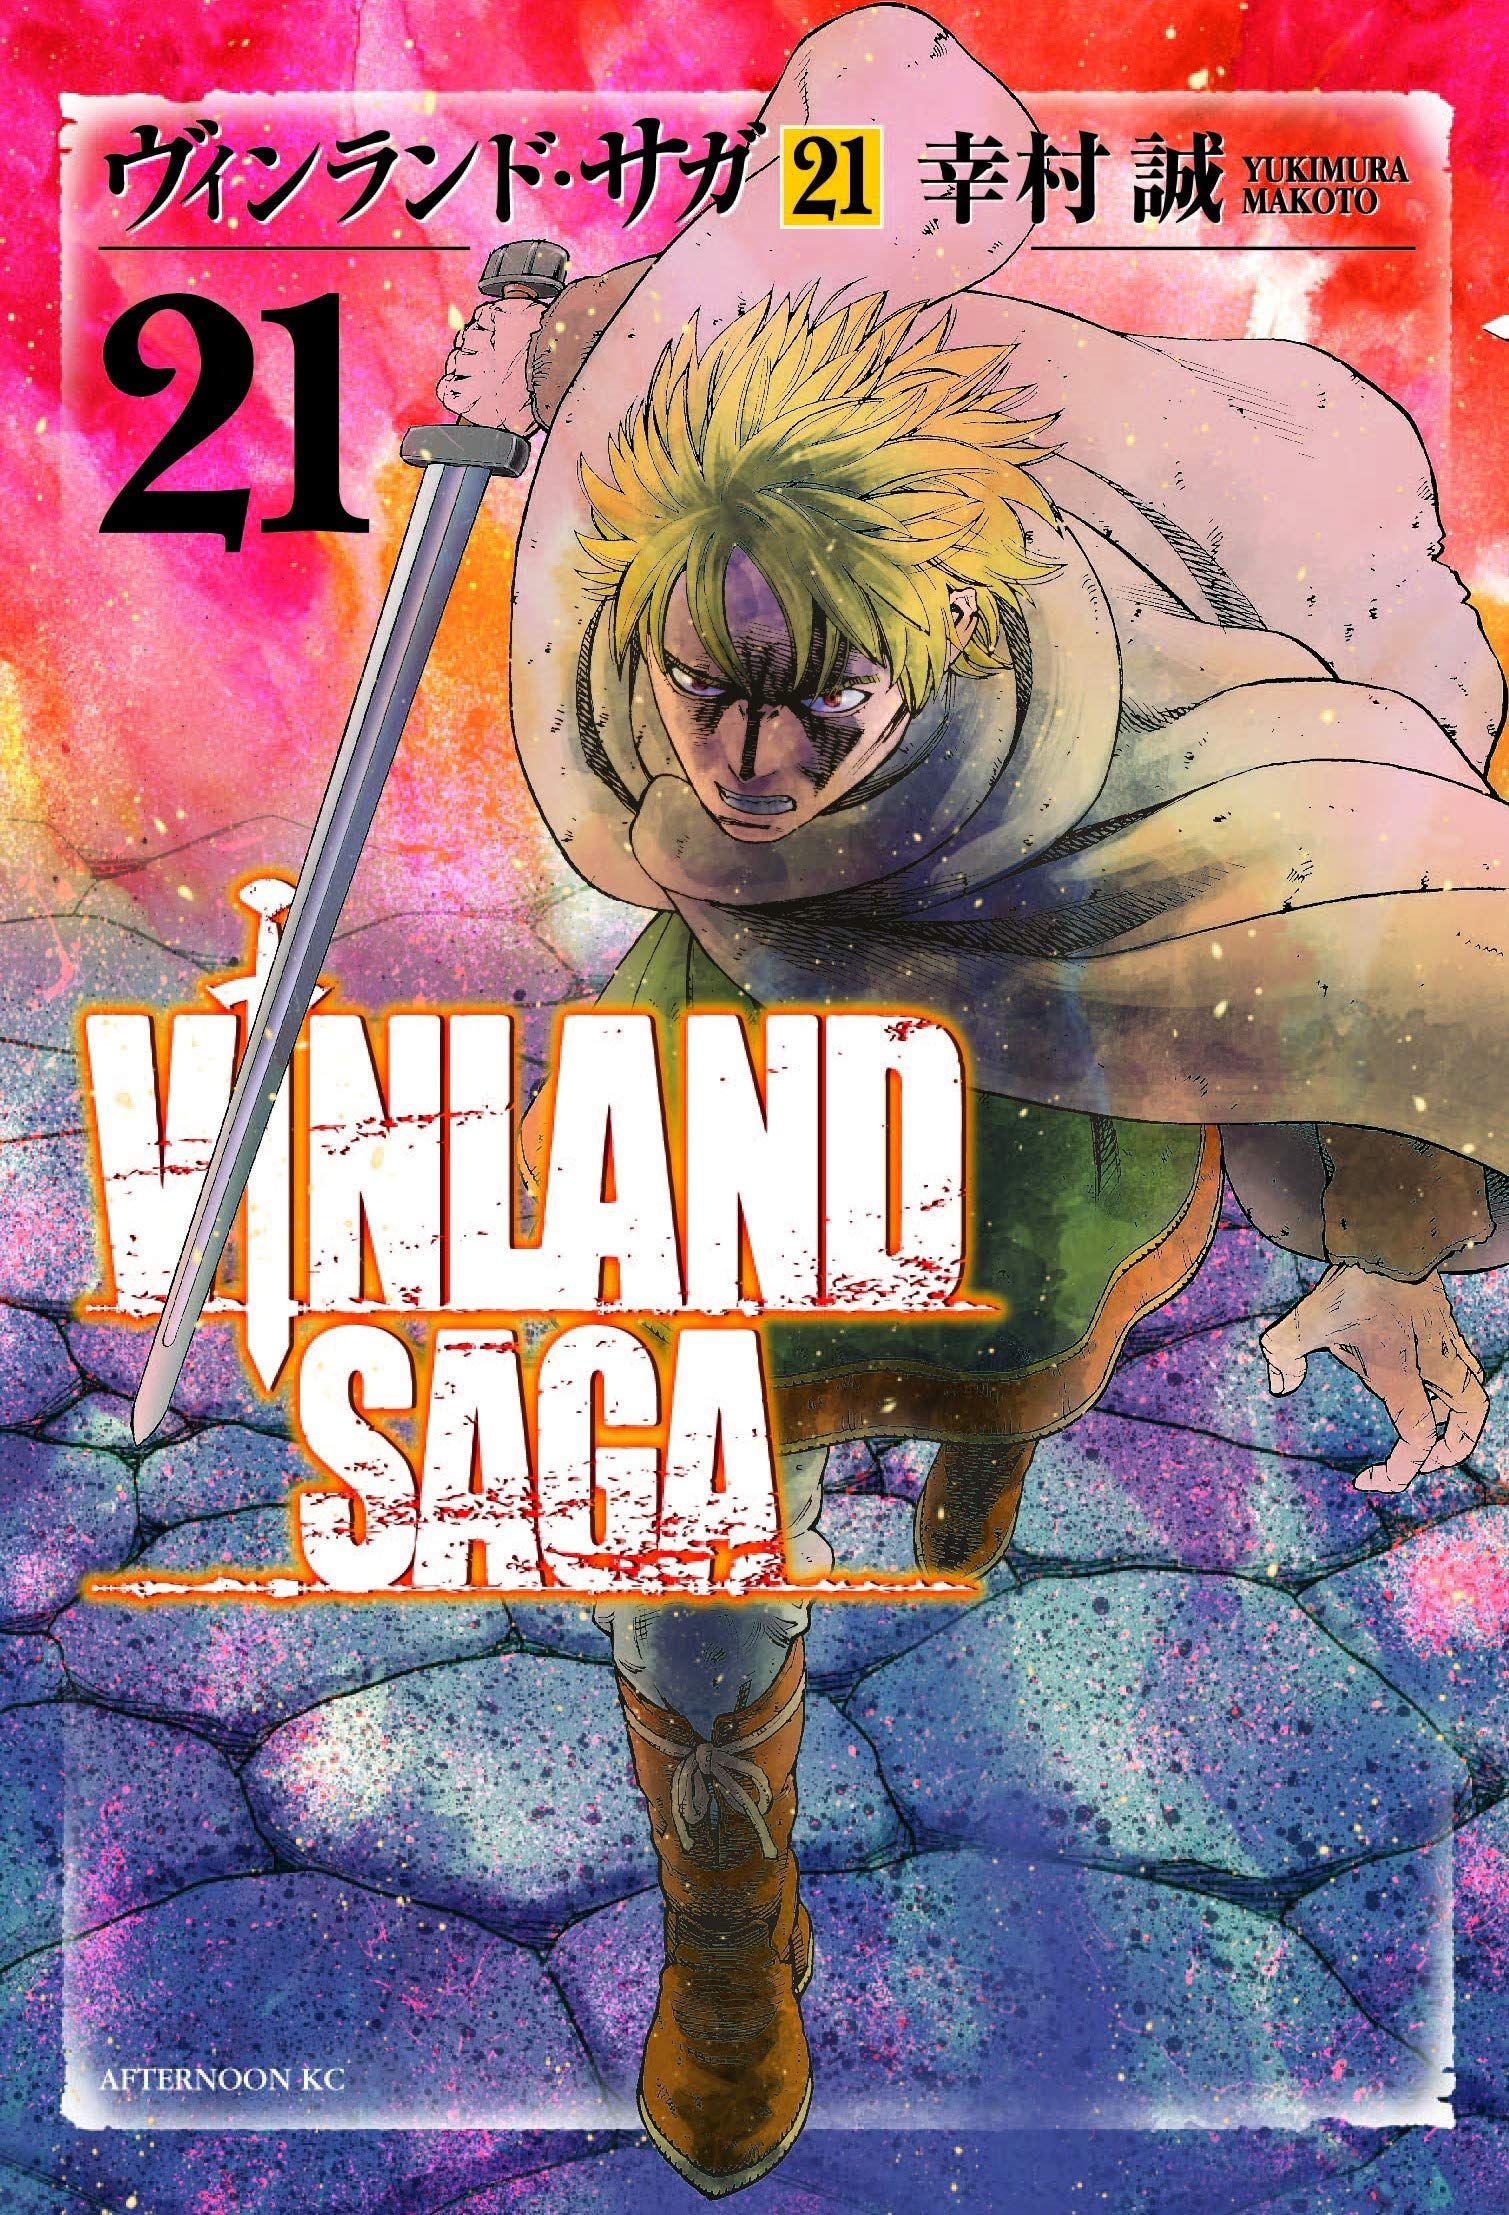 Vinland Saga 11 Hardcover �20November 19, 2019, Ad